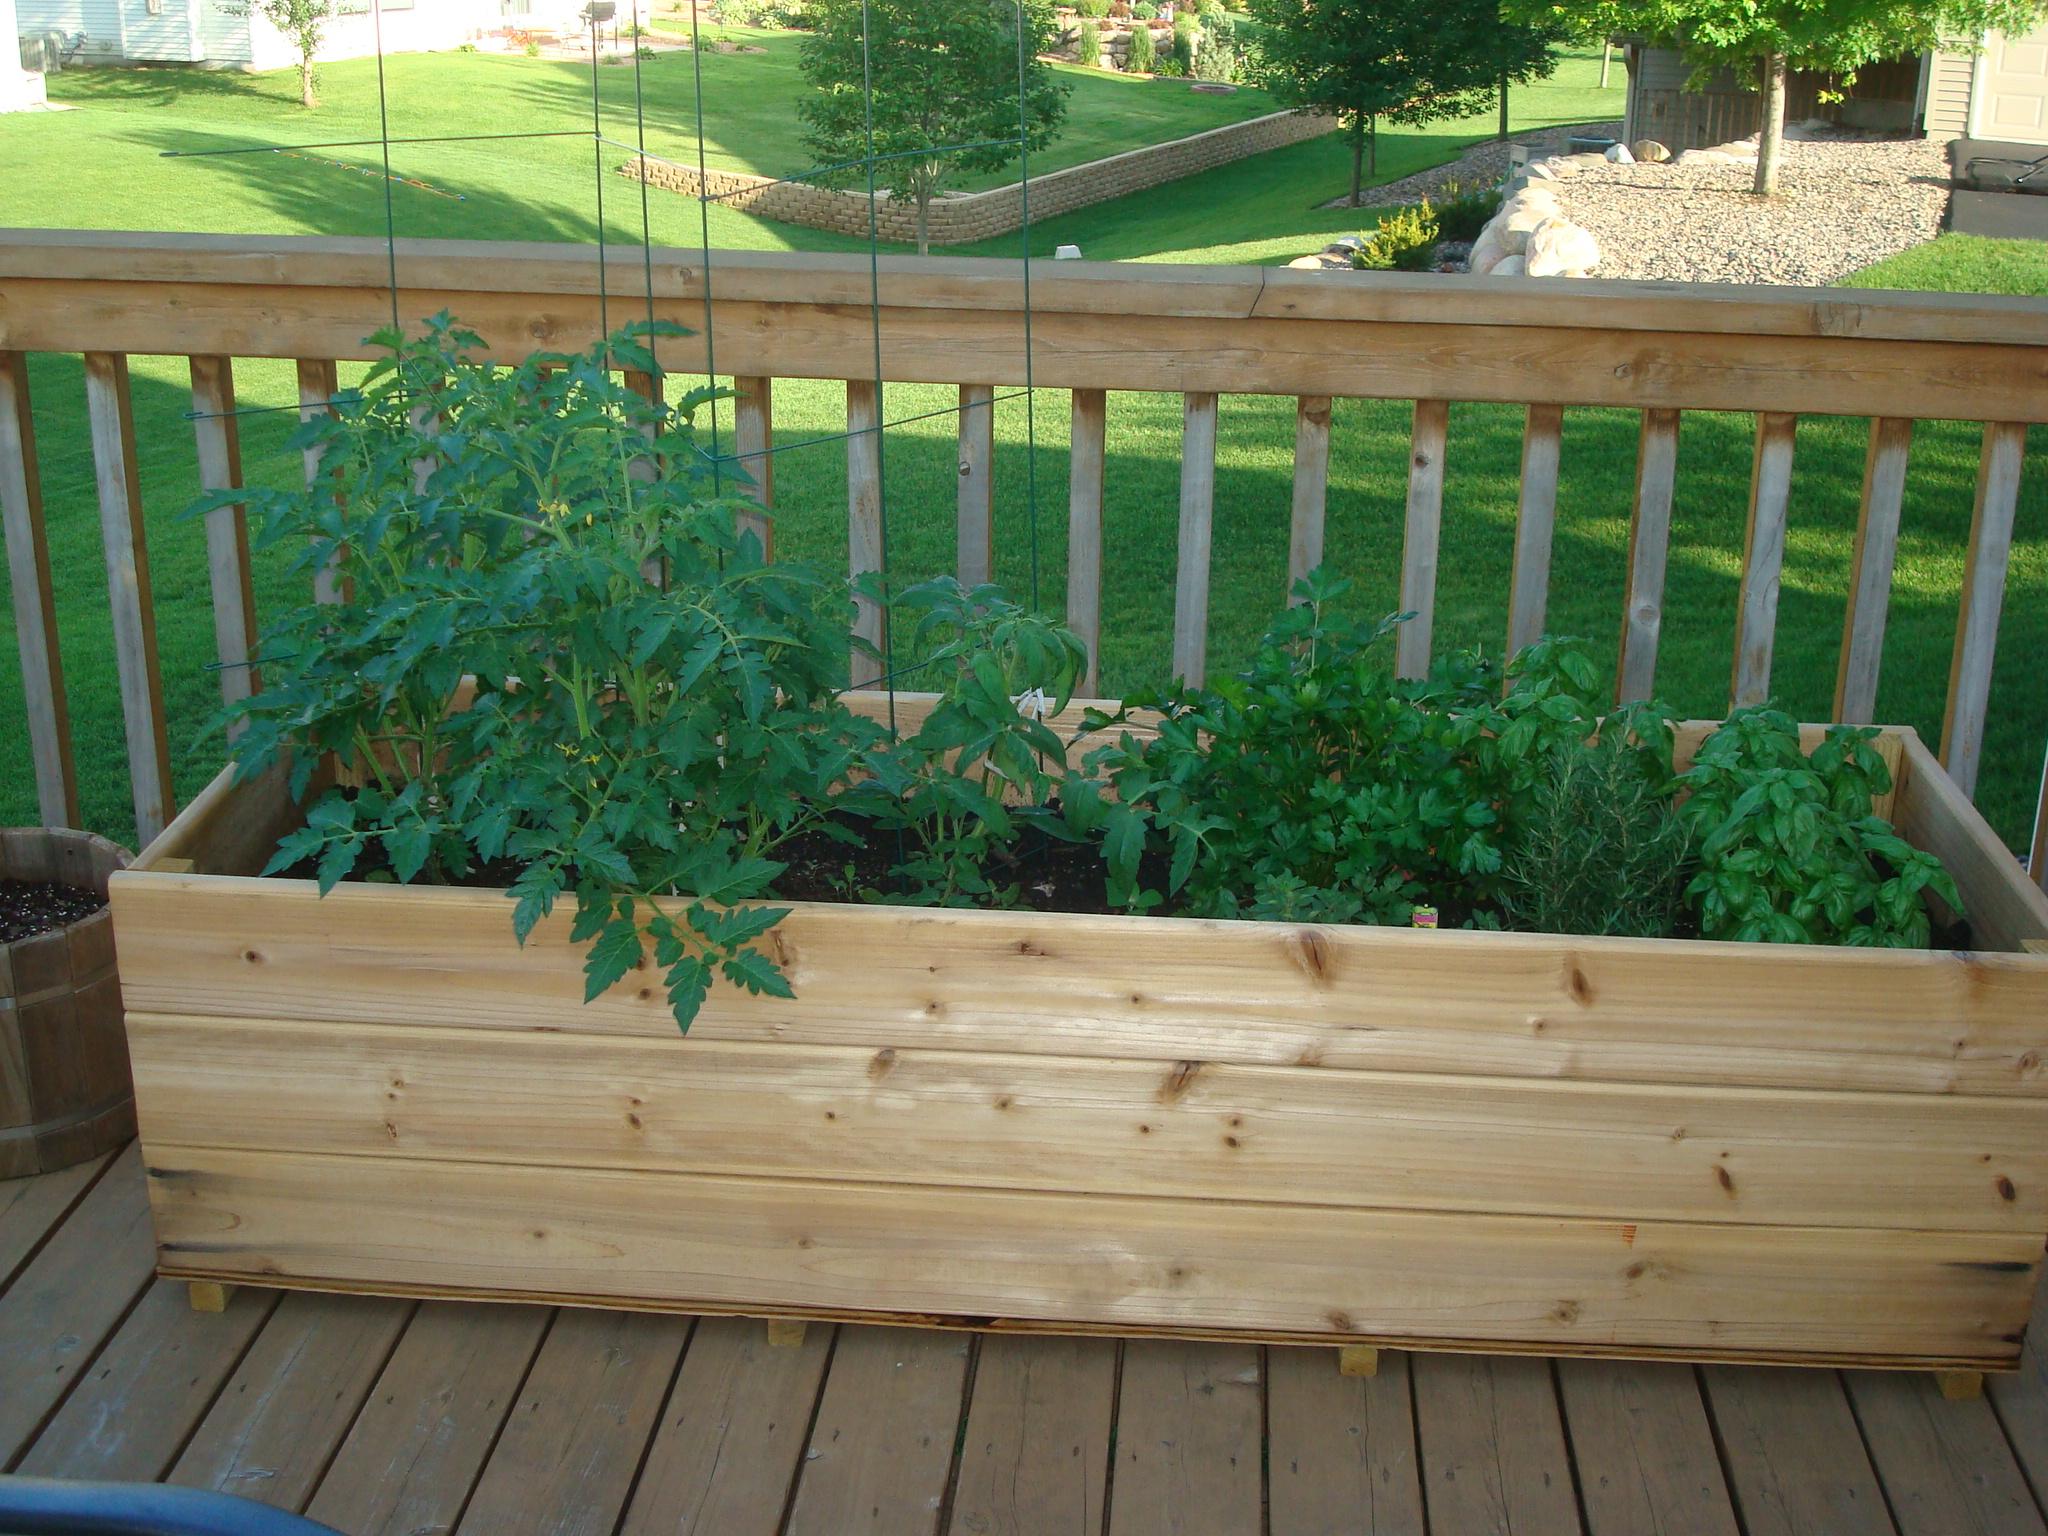 Deck Gardens Garden Design Garden Design With Container Gardens